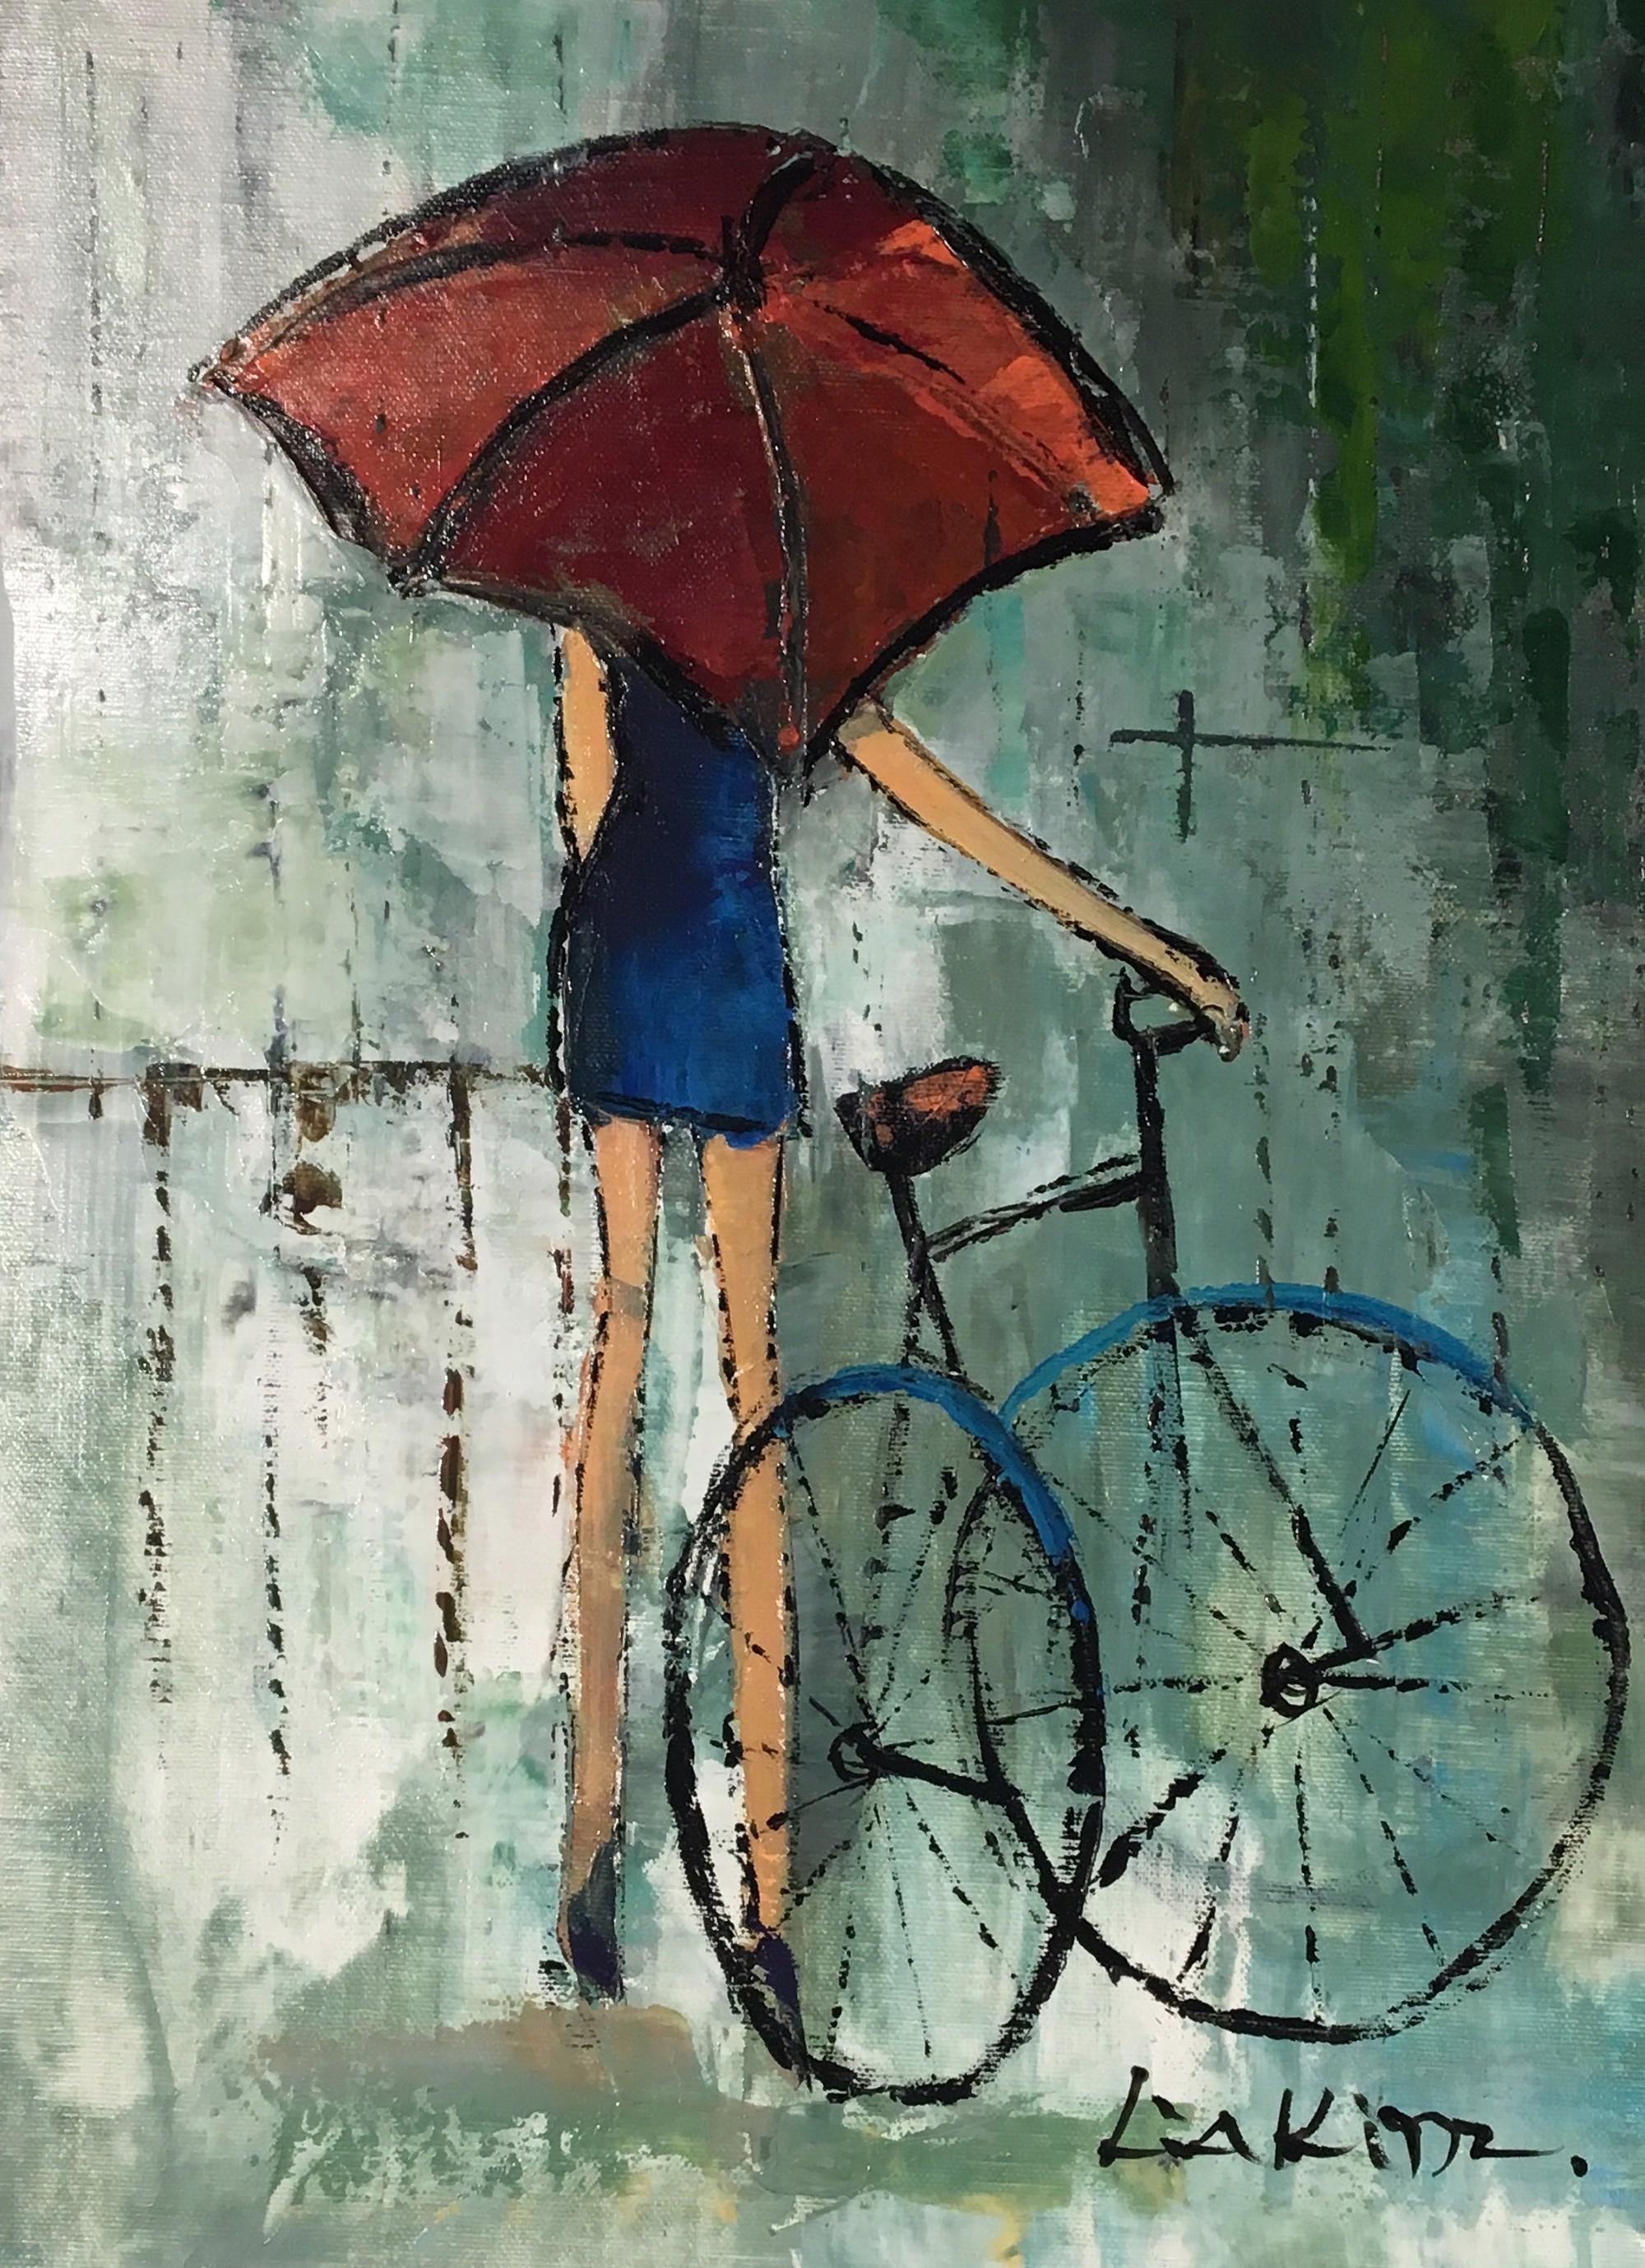 BICYCLE UMBRELLA by LIA KIM